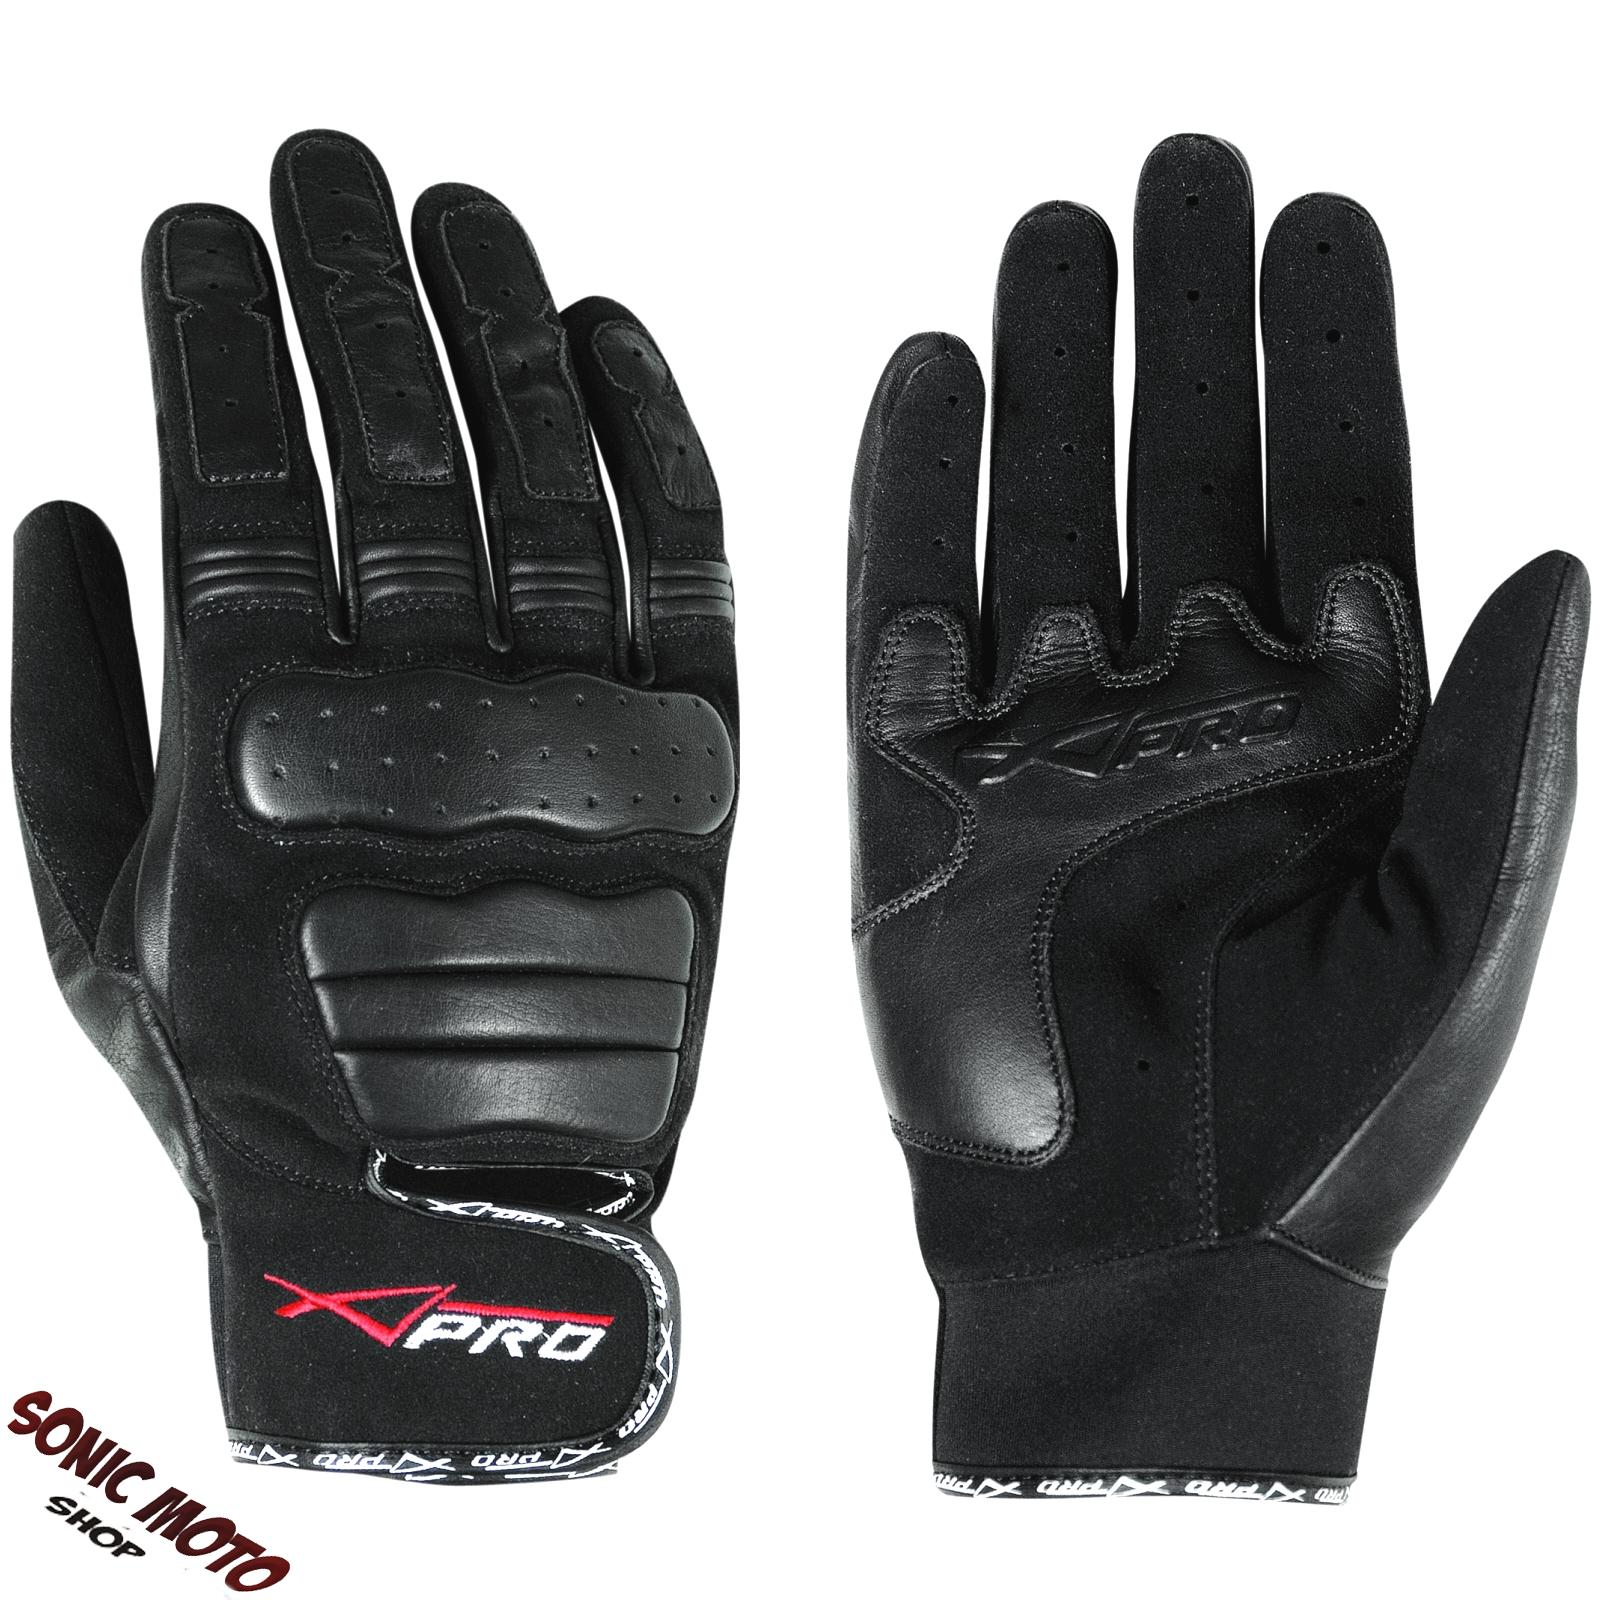 et gants courts cuir tissu moto scooter protections motard tex ebay. Black Bedroom Furniture Sets. Home Design Ideas